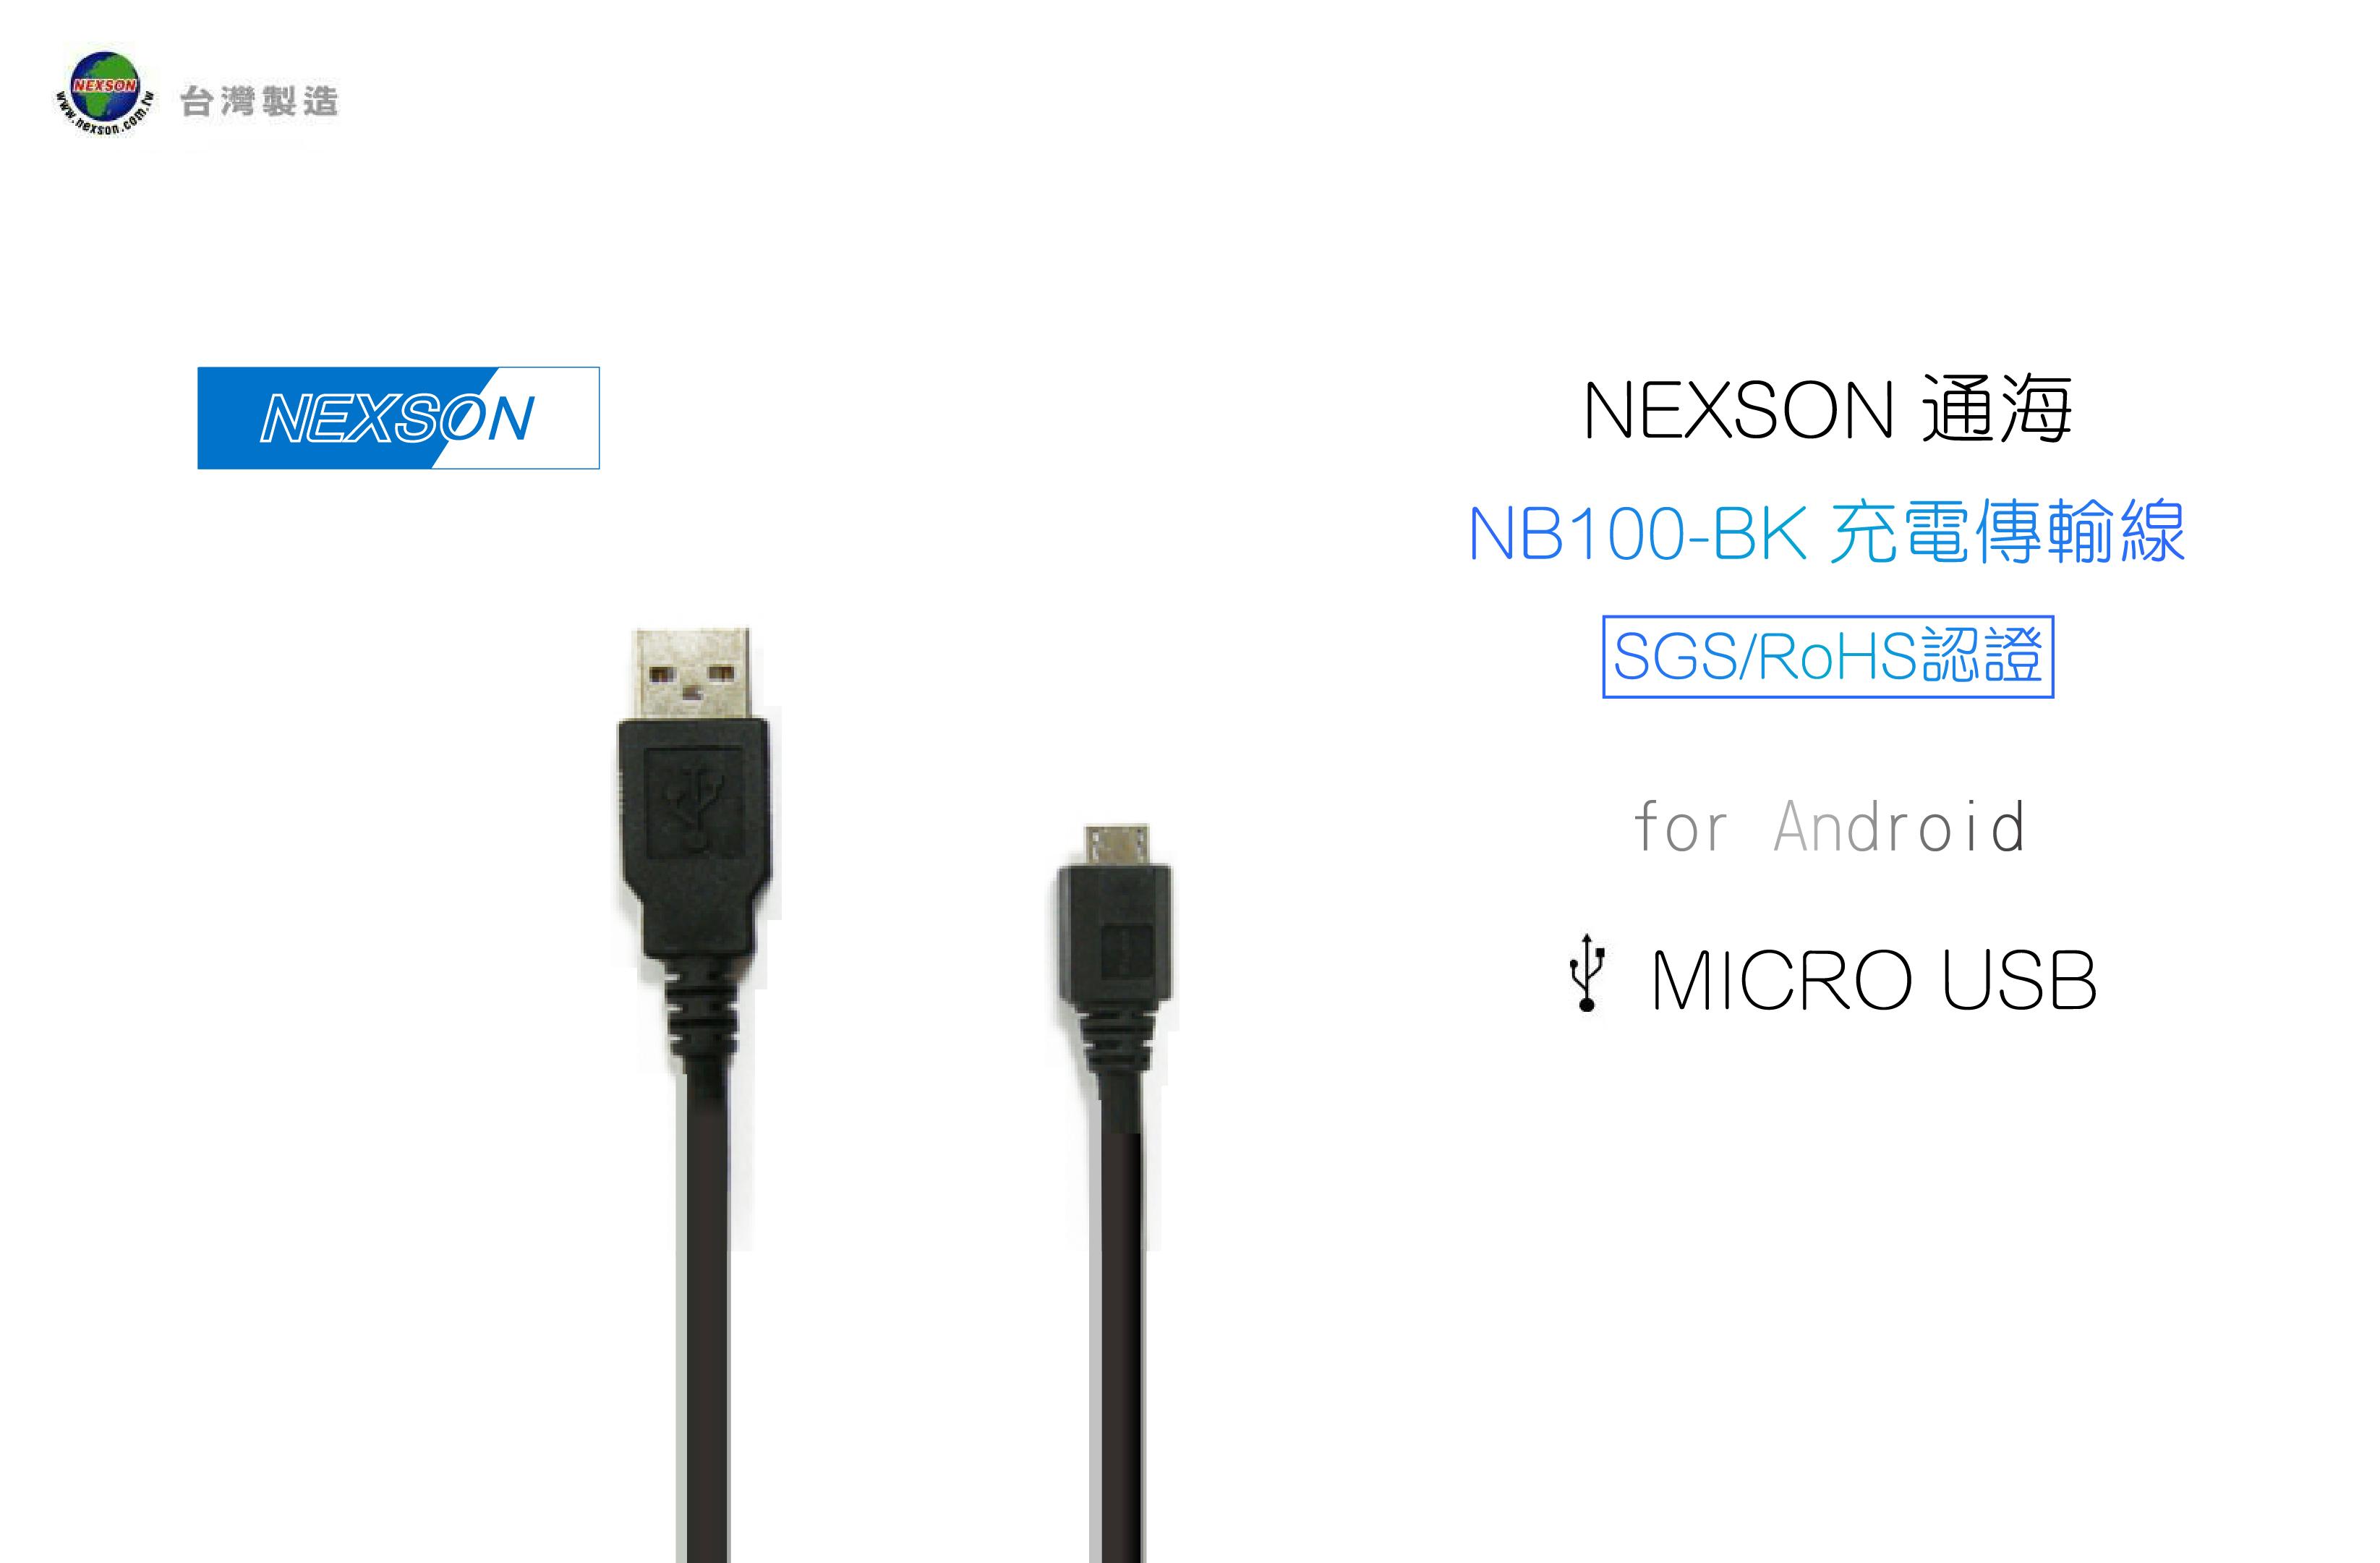 NEXSON通海MICRO USB NB100 手機傳輸電源充電線 HTC SONY SAMSUNG LG